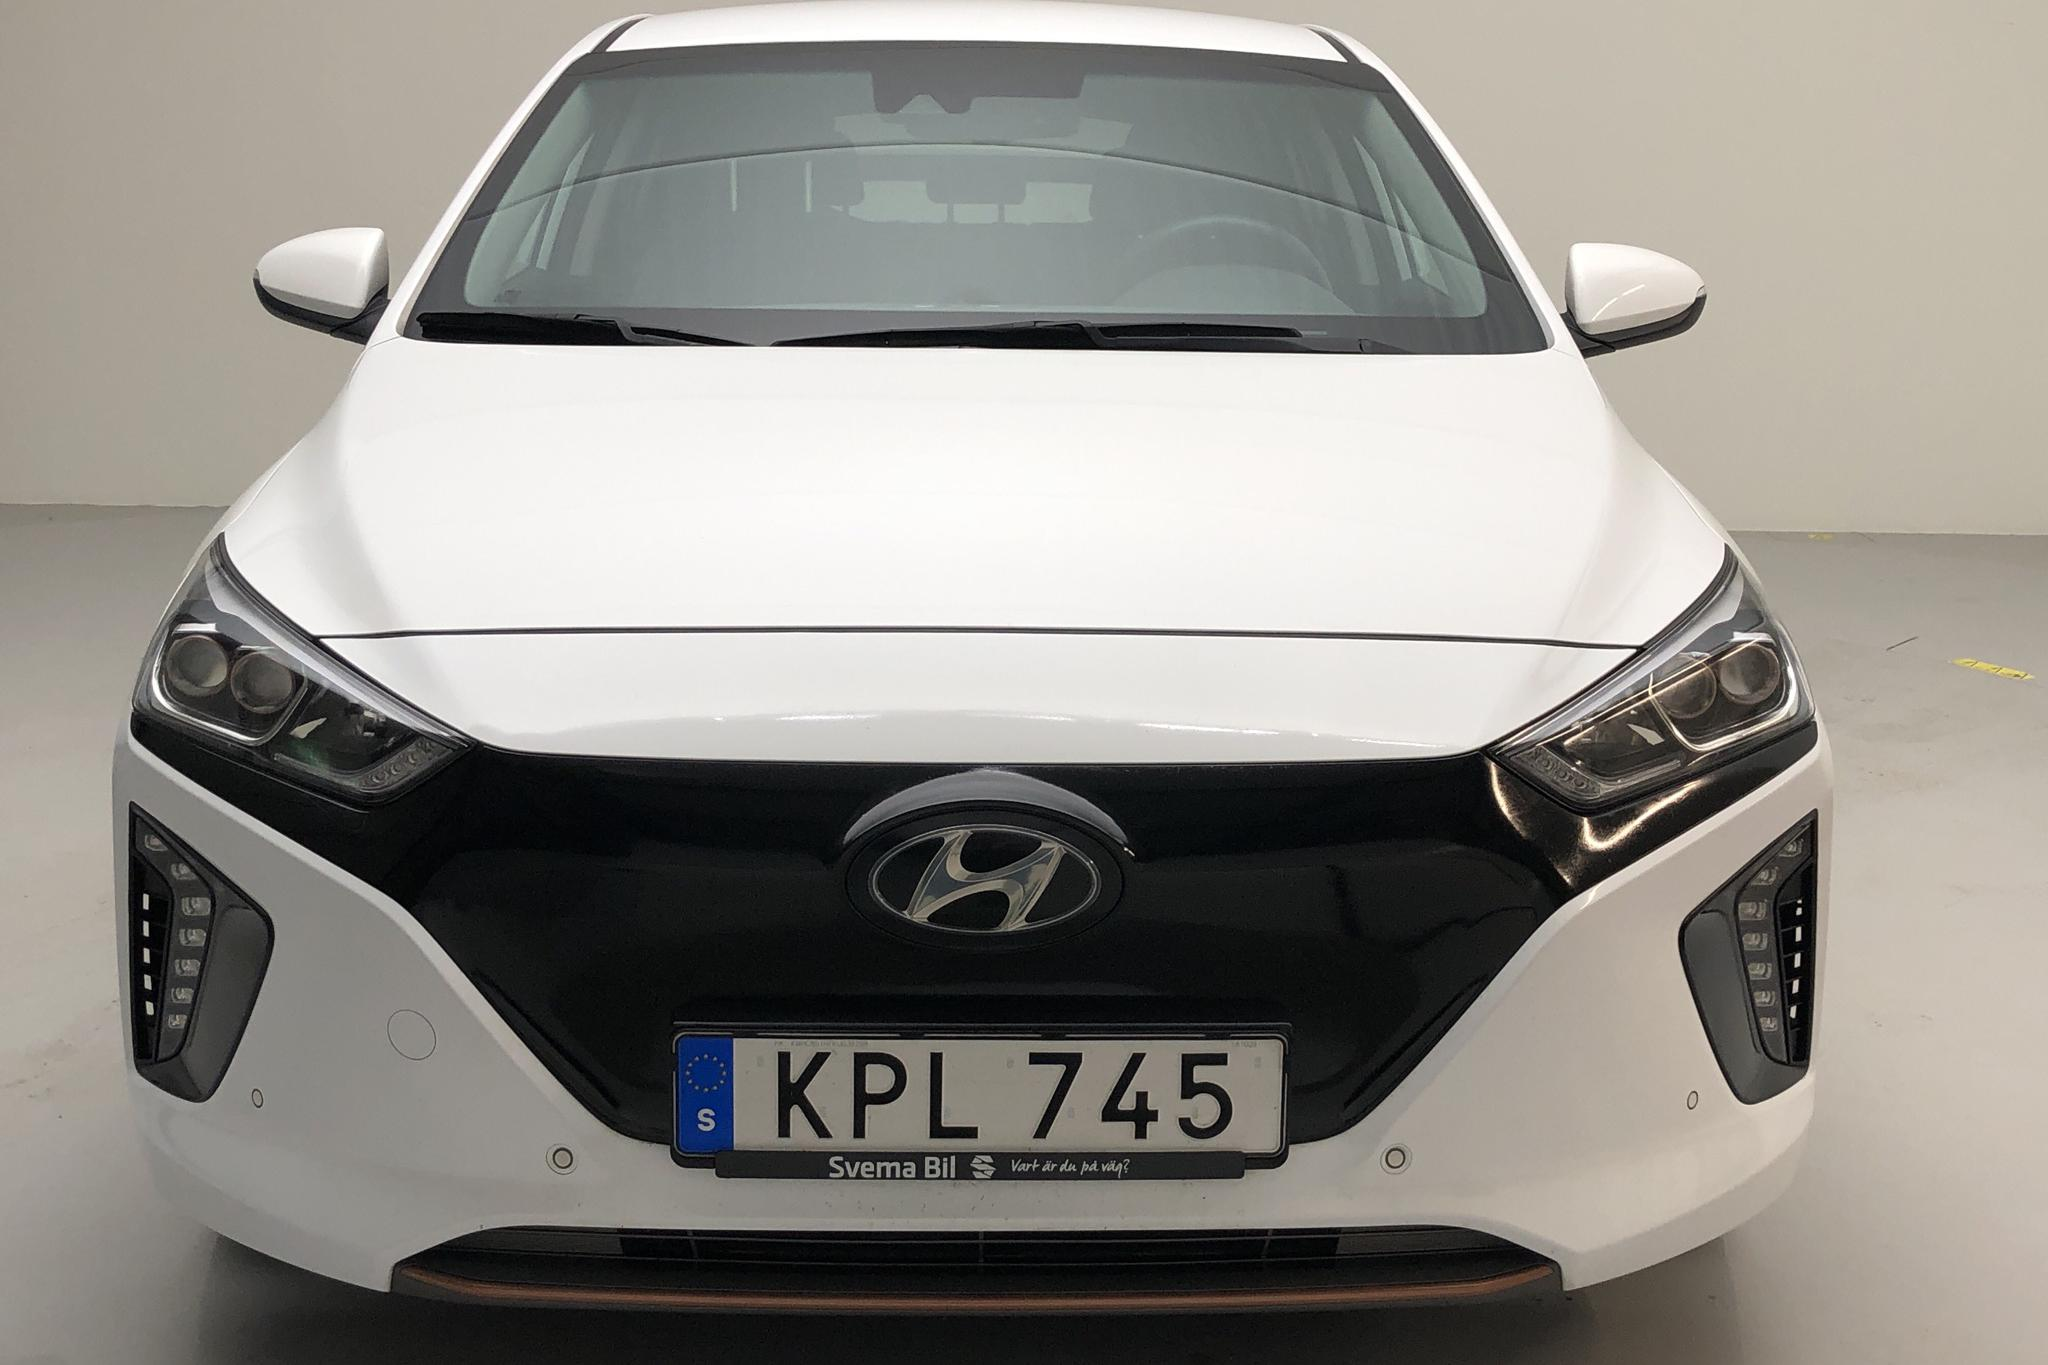 Hyundai IONIQ Electric (120hk) - 15 420 km - Automatic - white - 2019